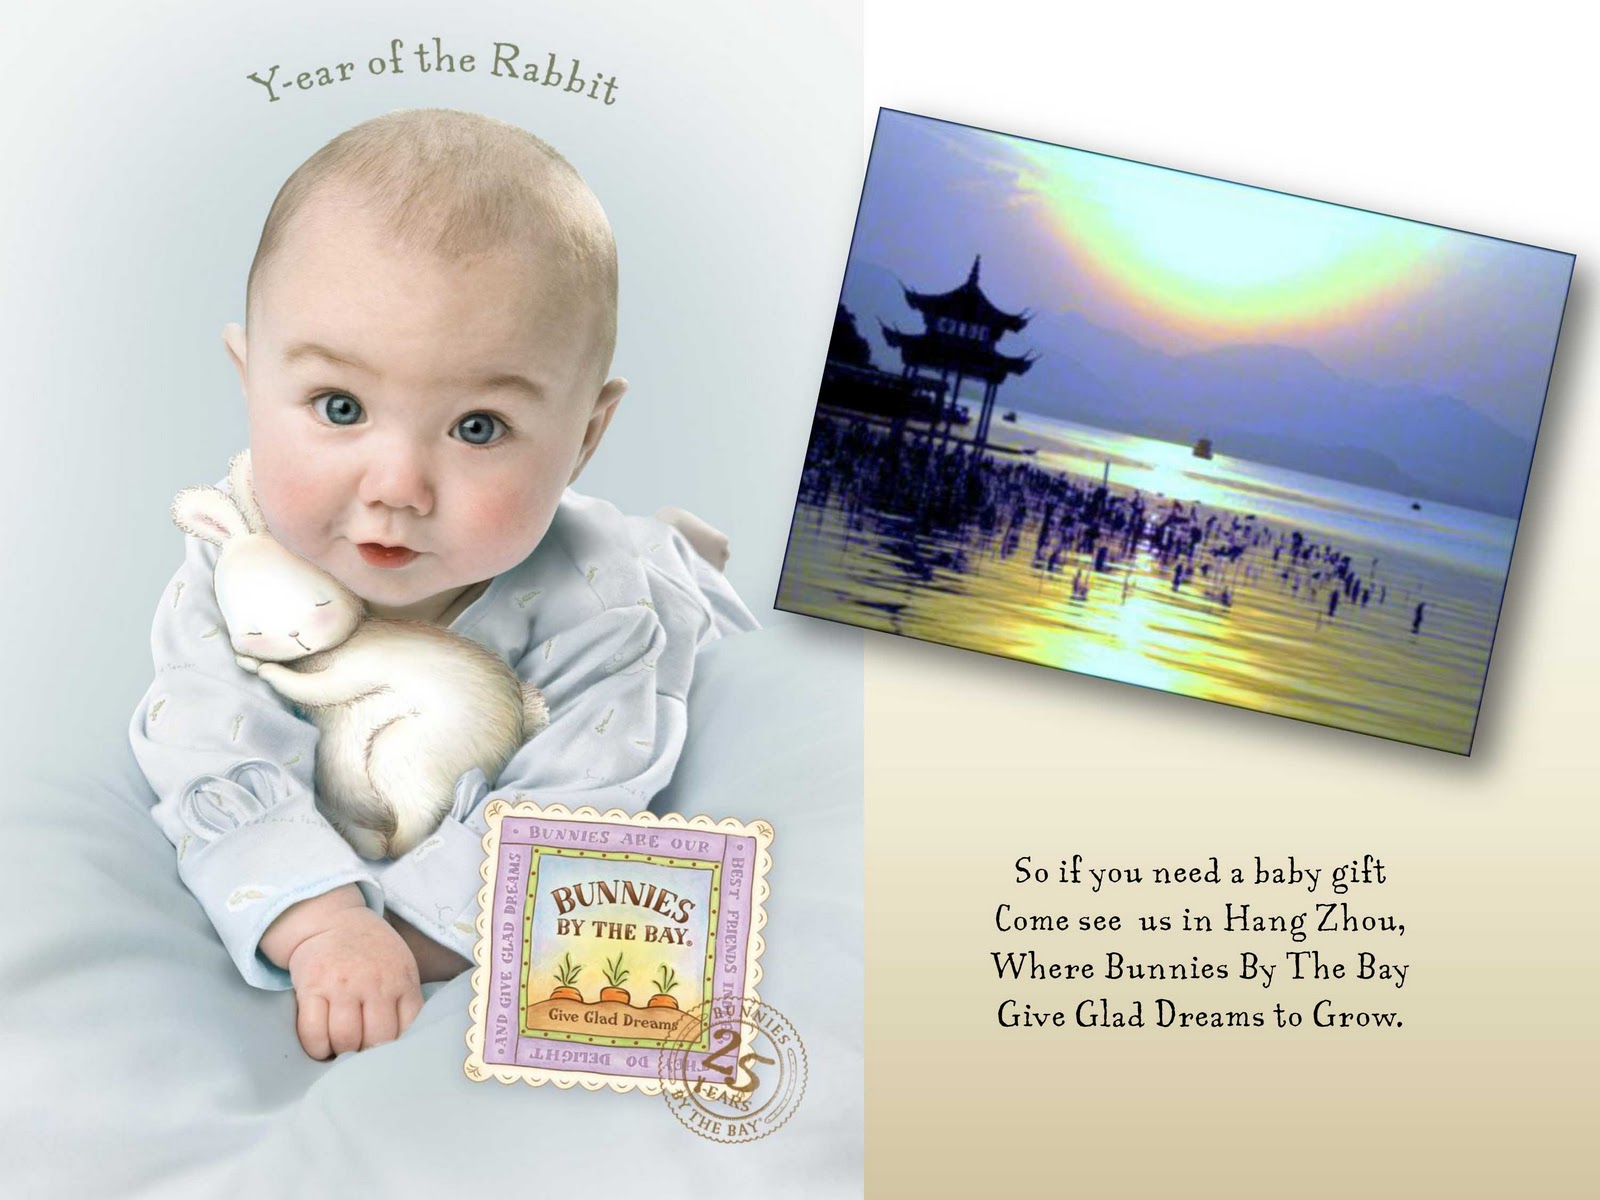 http://1.bp.blogspot.com/_9rBlT6pUYpw/TSNO5TyUZDI/AAAAAAAAC8c/3ALYk5SmItI/s1600/store+china+3.jpg